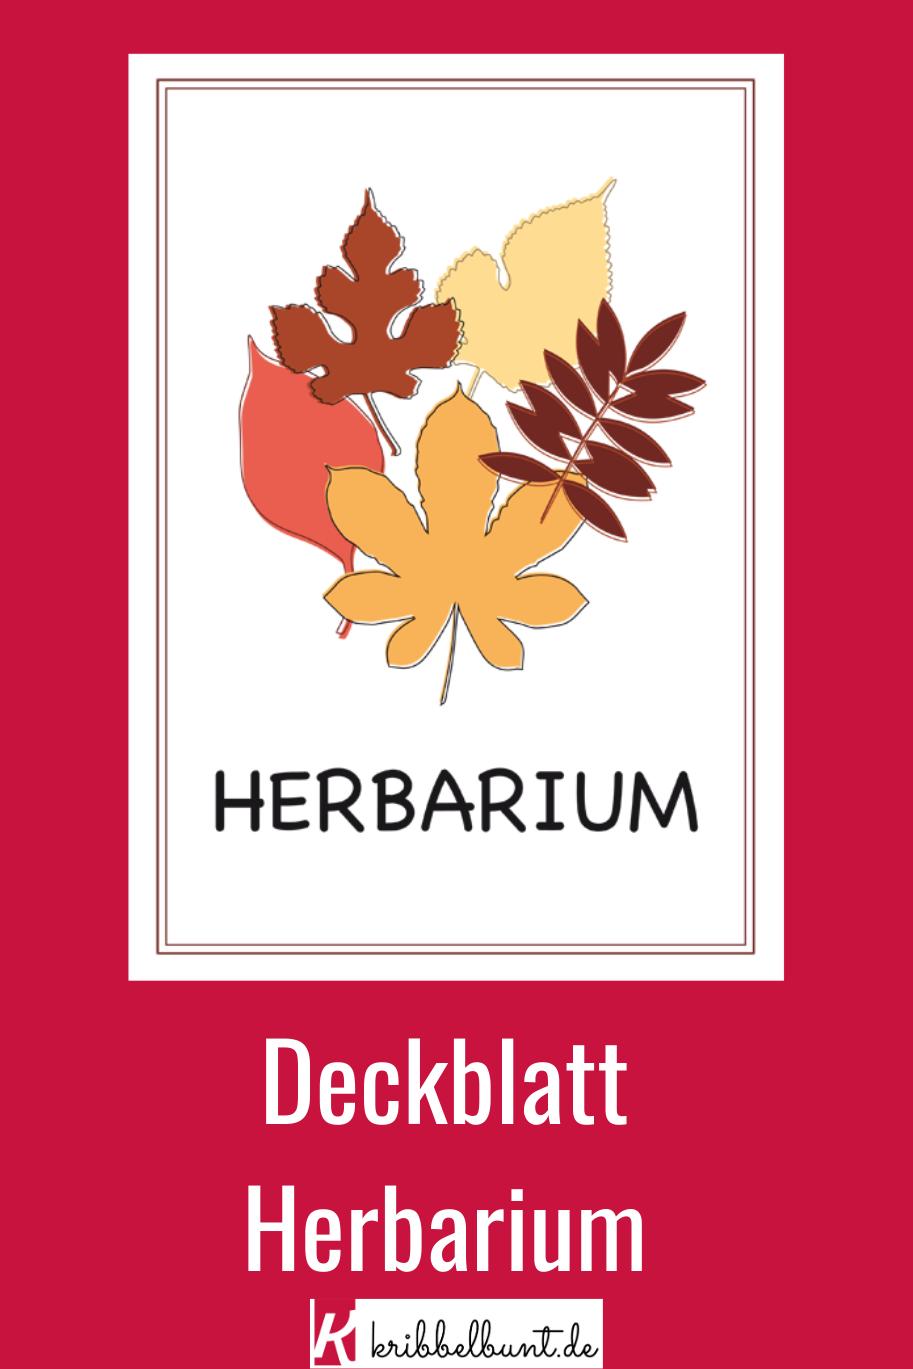 Herbarium Deckblatt Fur Die Schule Zum Ausdrucken Deckblatt Herbarium Vorlage Decken